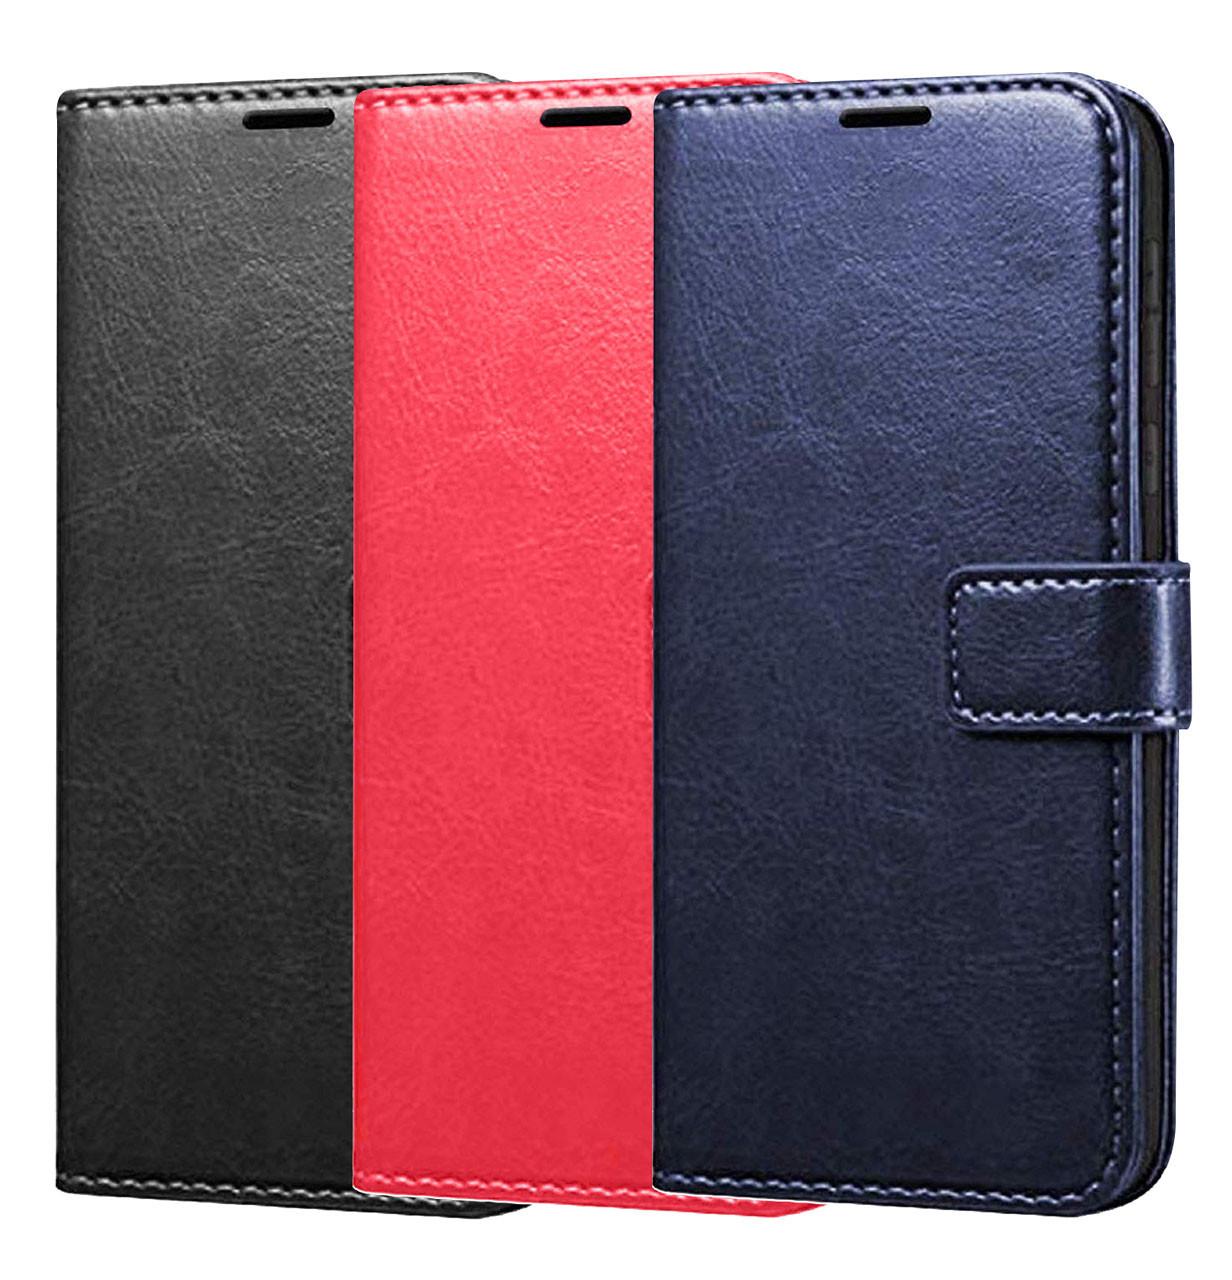 Чехол-книжка Wallet Glossy с визитницей для Xiaomi Redmi 8A